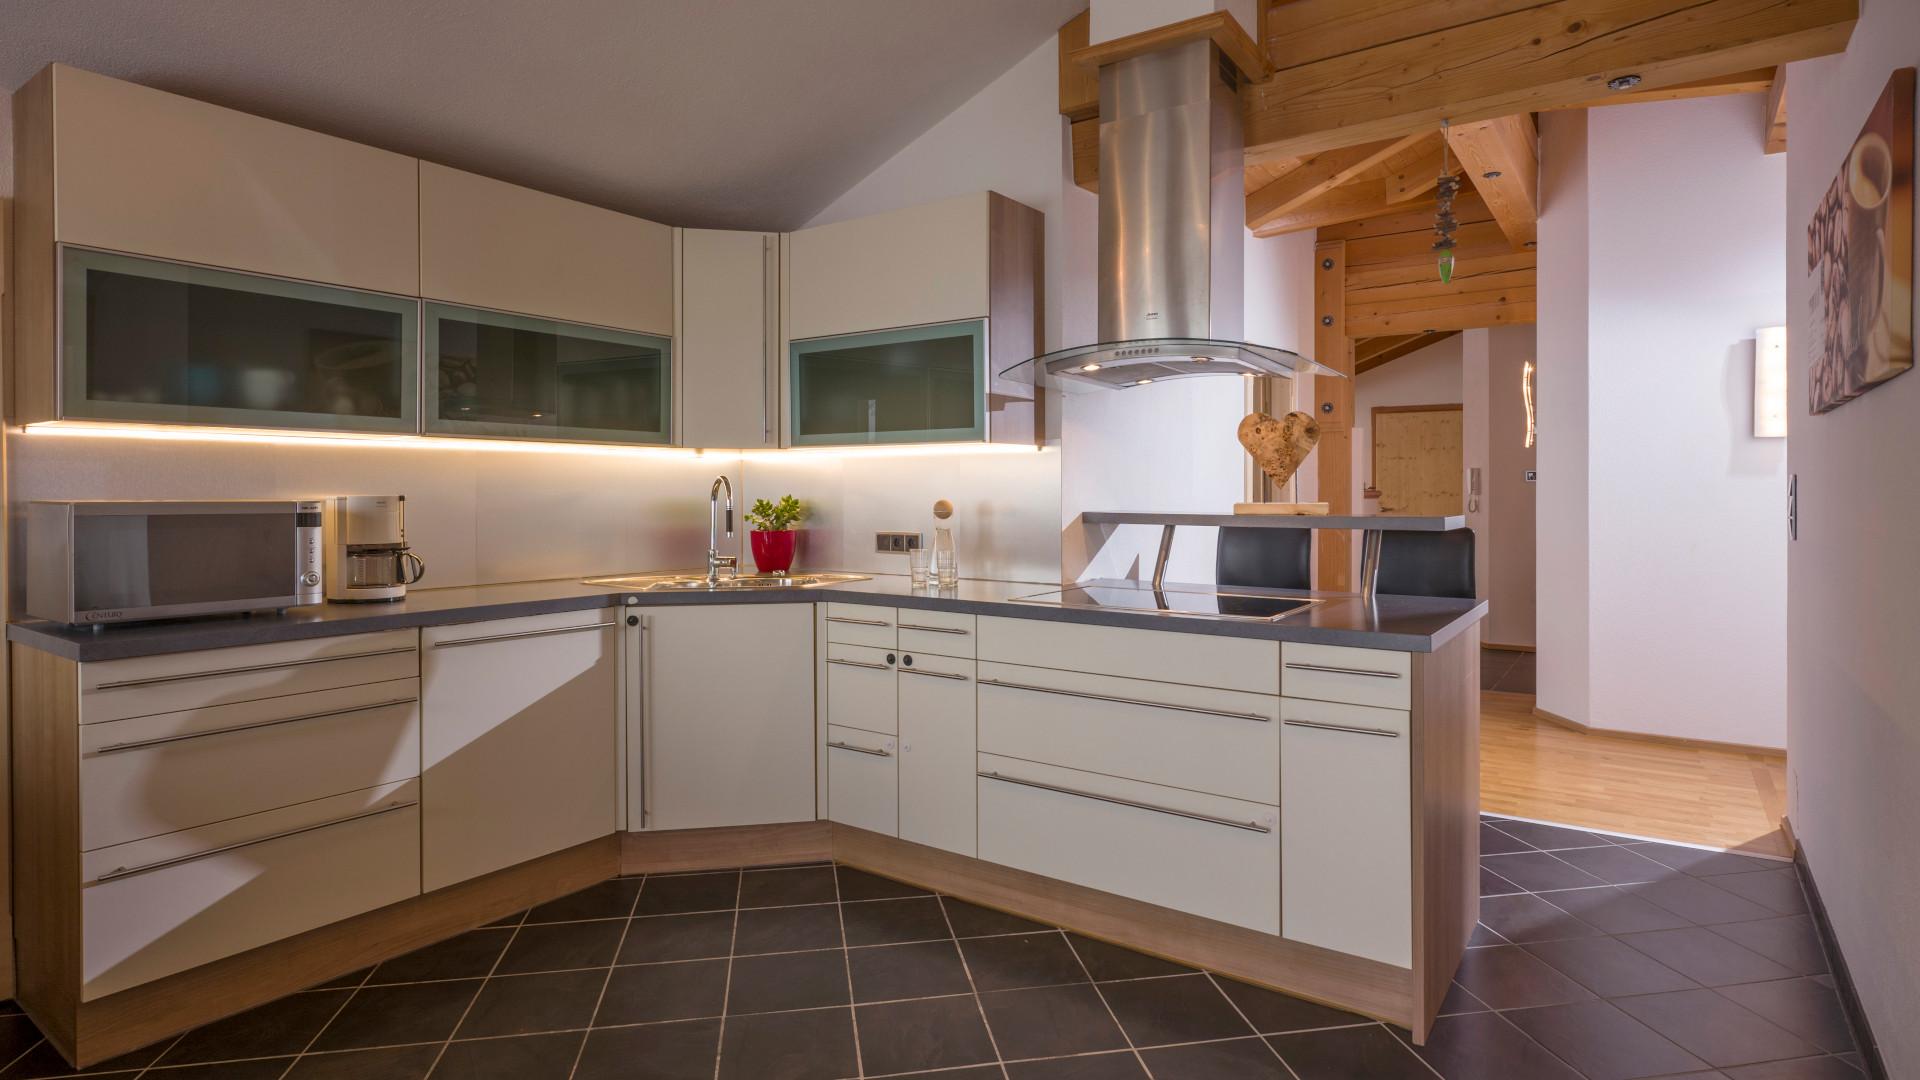 Panoramablick Küche 1920x1080